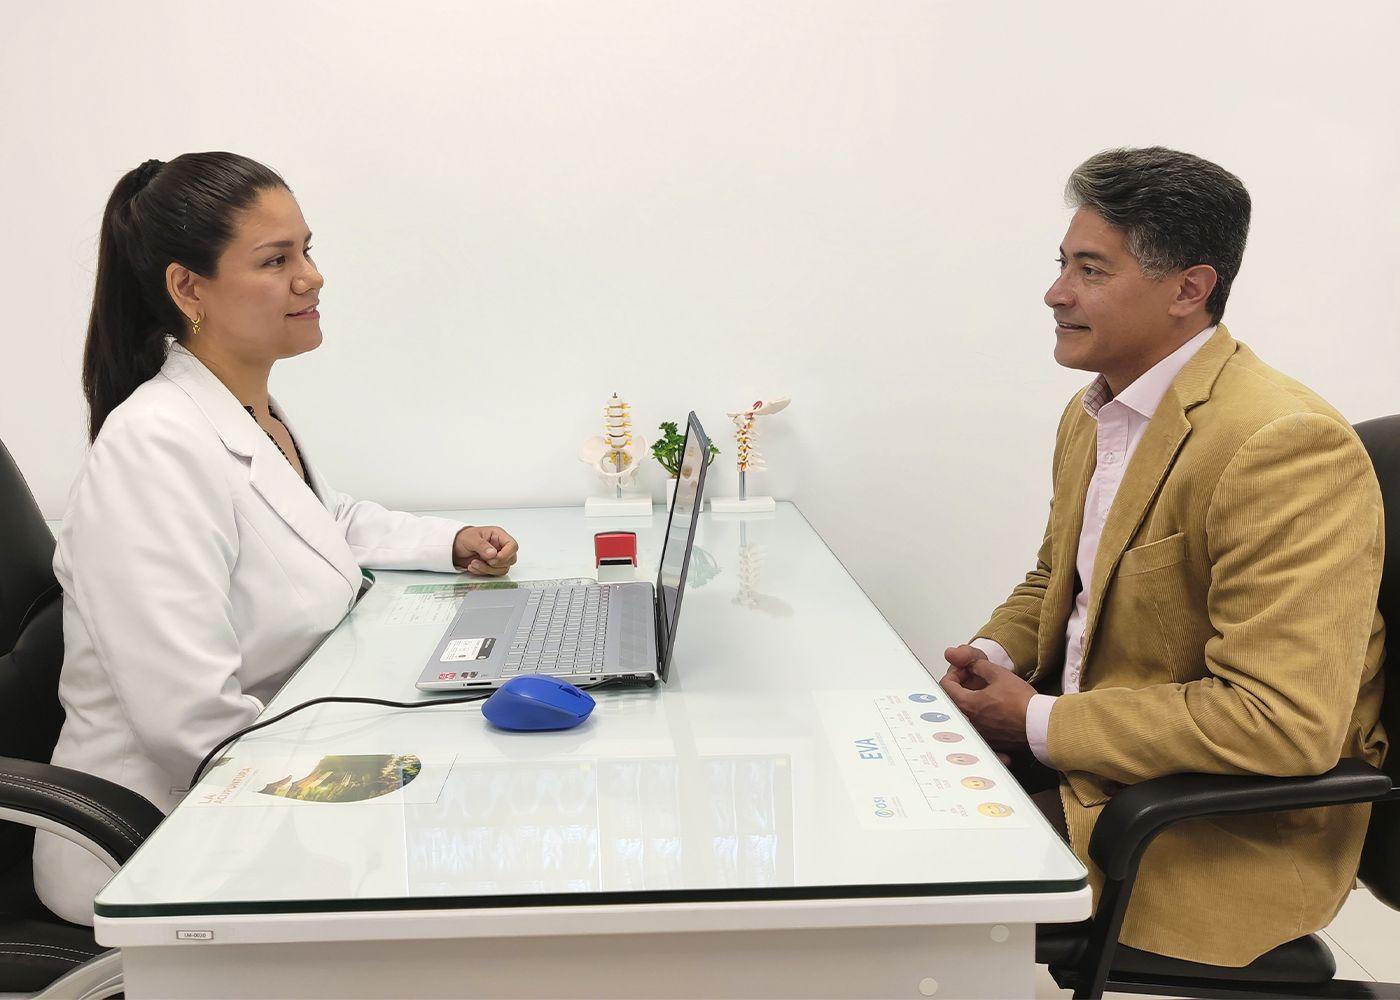 paciente con ACV en consulta medica OSI